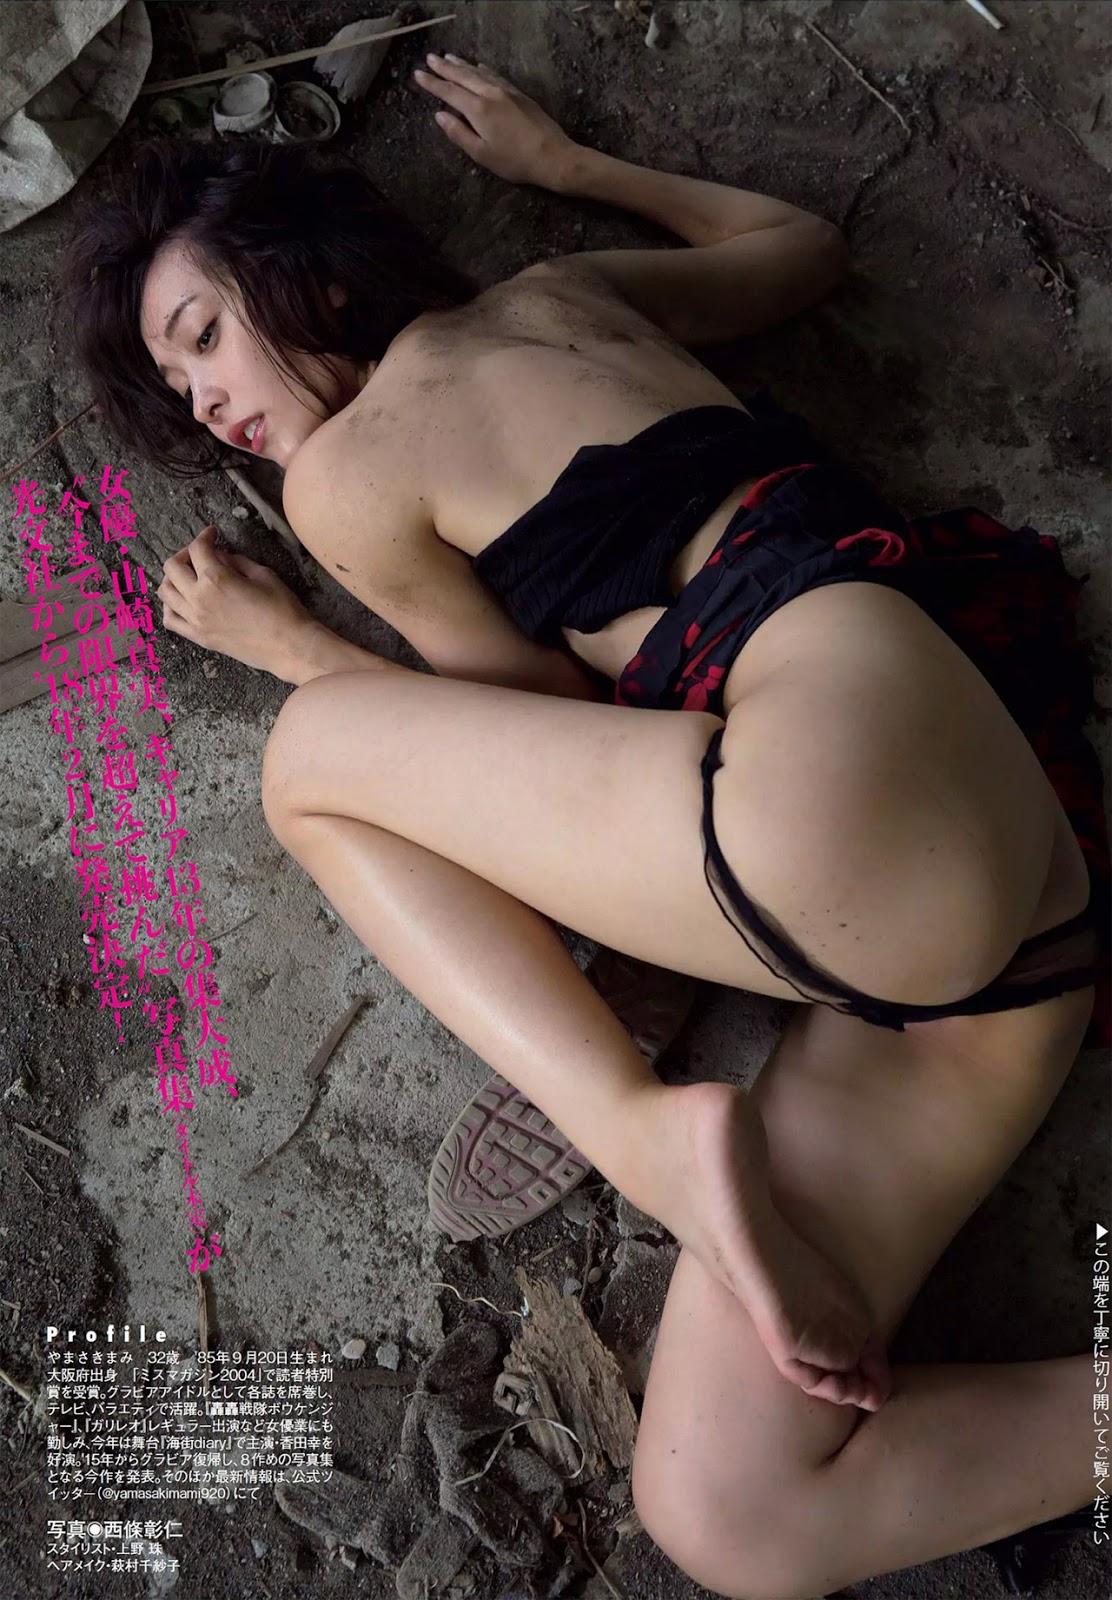 Mami Yamasaki 山崎真実, FLASH 電子版 2018.01.02 (フラッシュ 2018年01月02日号)